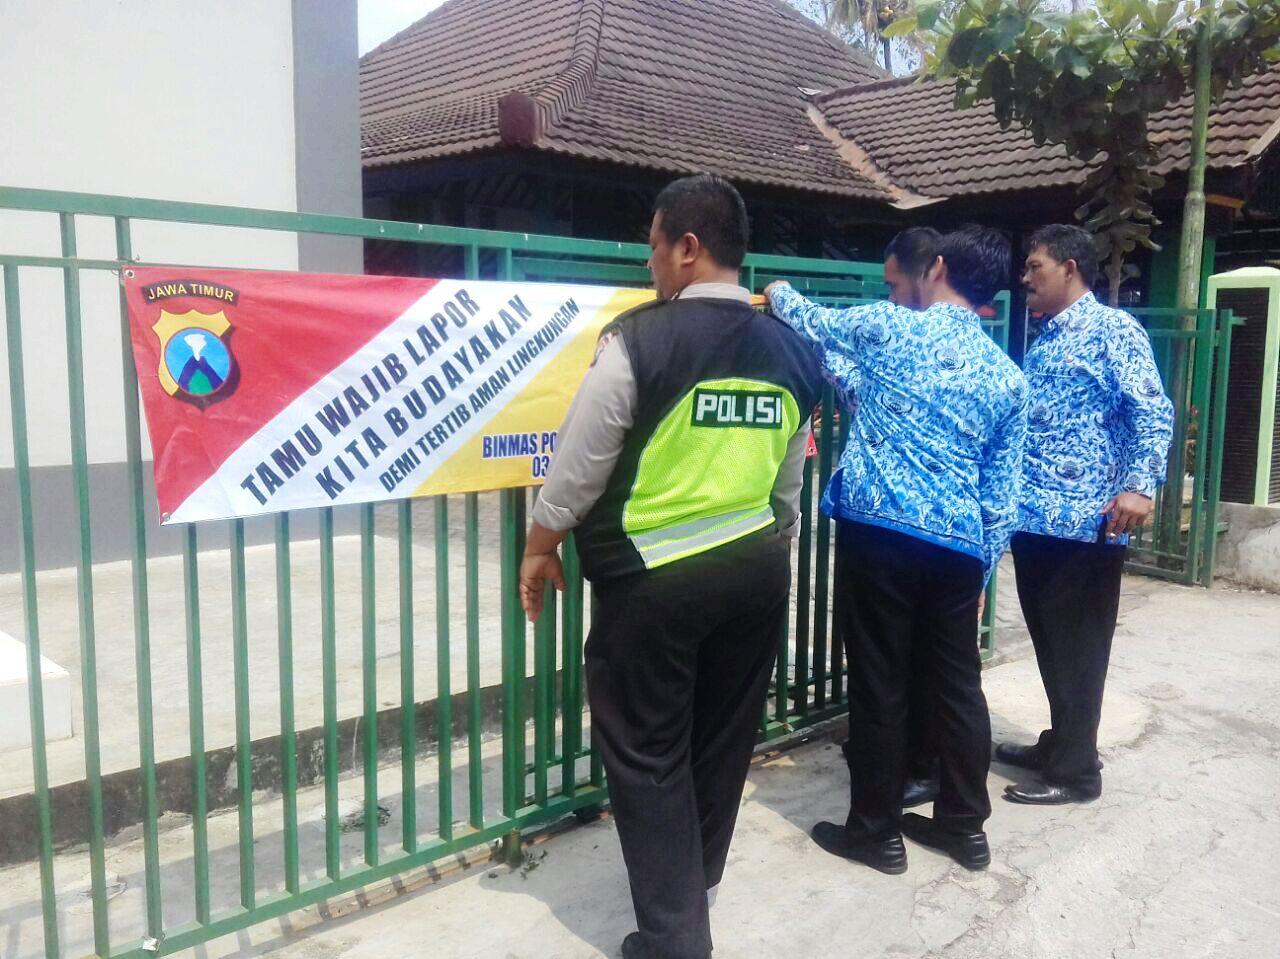 Demi Tertib dan Amang di Lingkungan Kanit Binmas Polsek Batu Kota Polres Batu Pasang Banner Himbauan Untuk Wajib Laporan